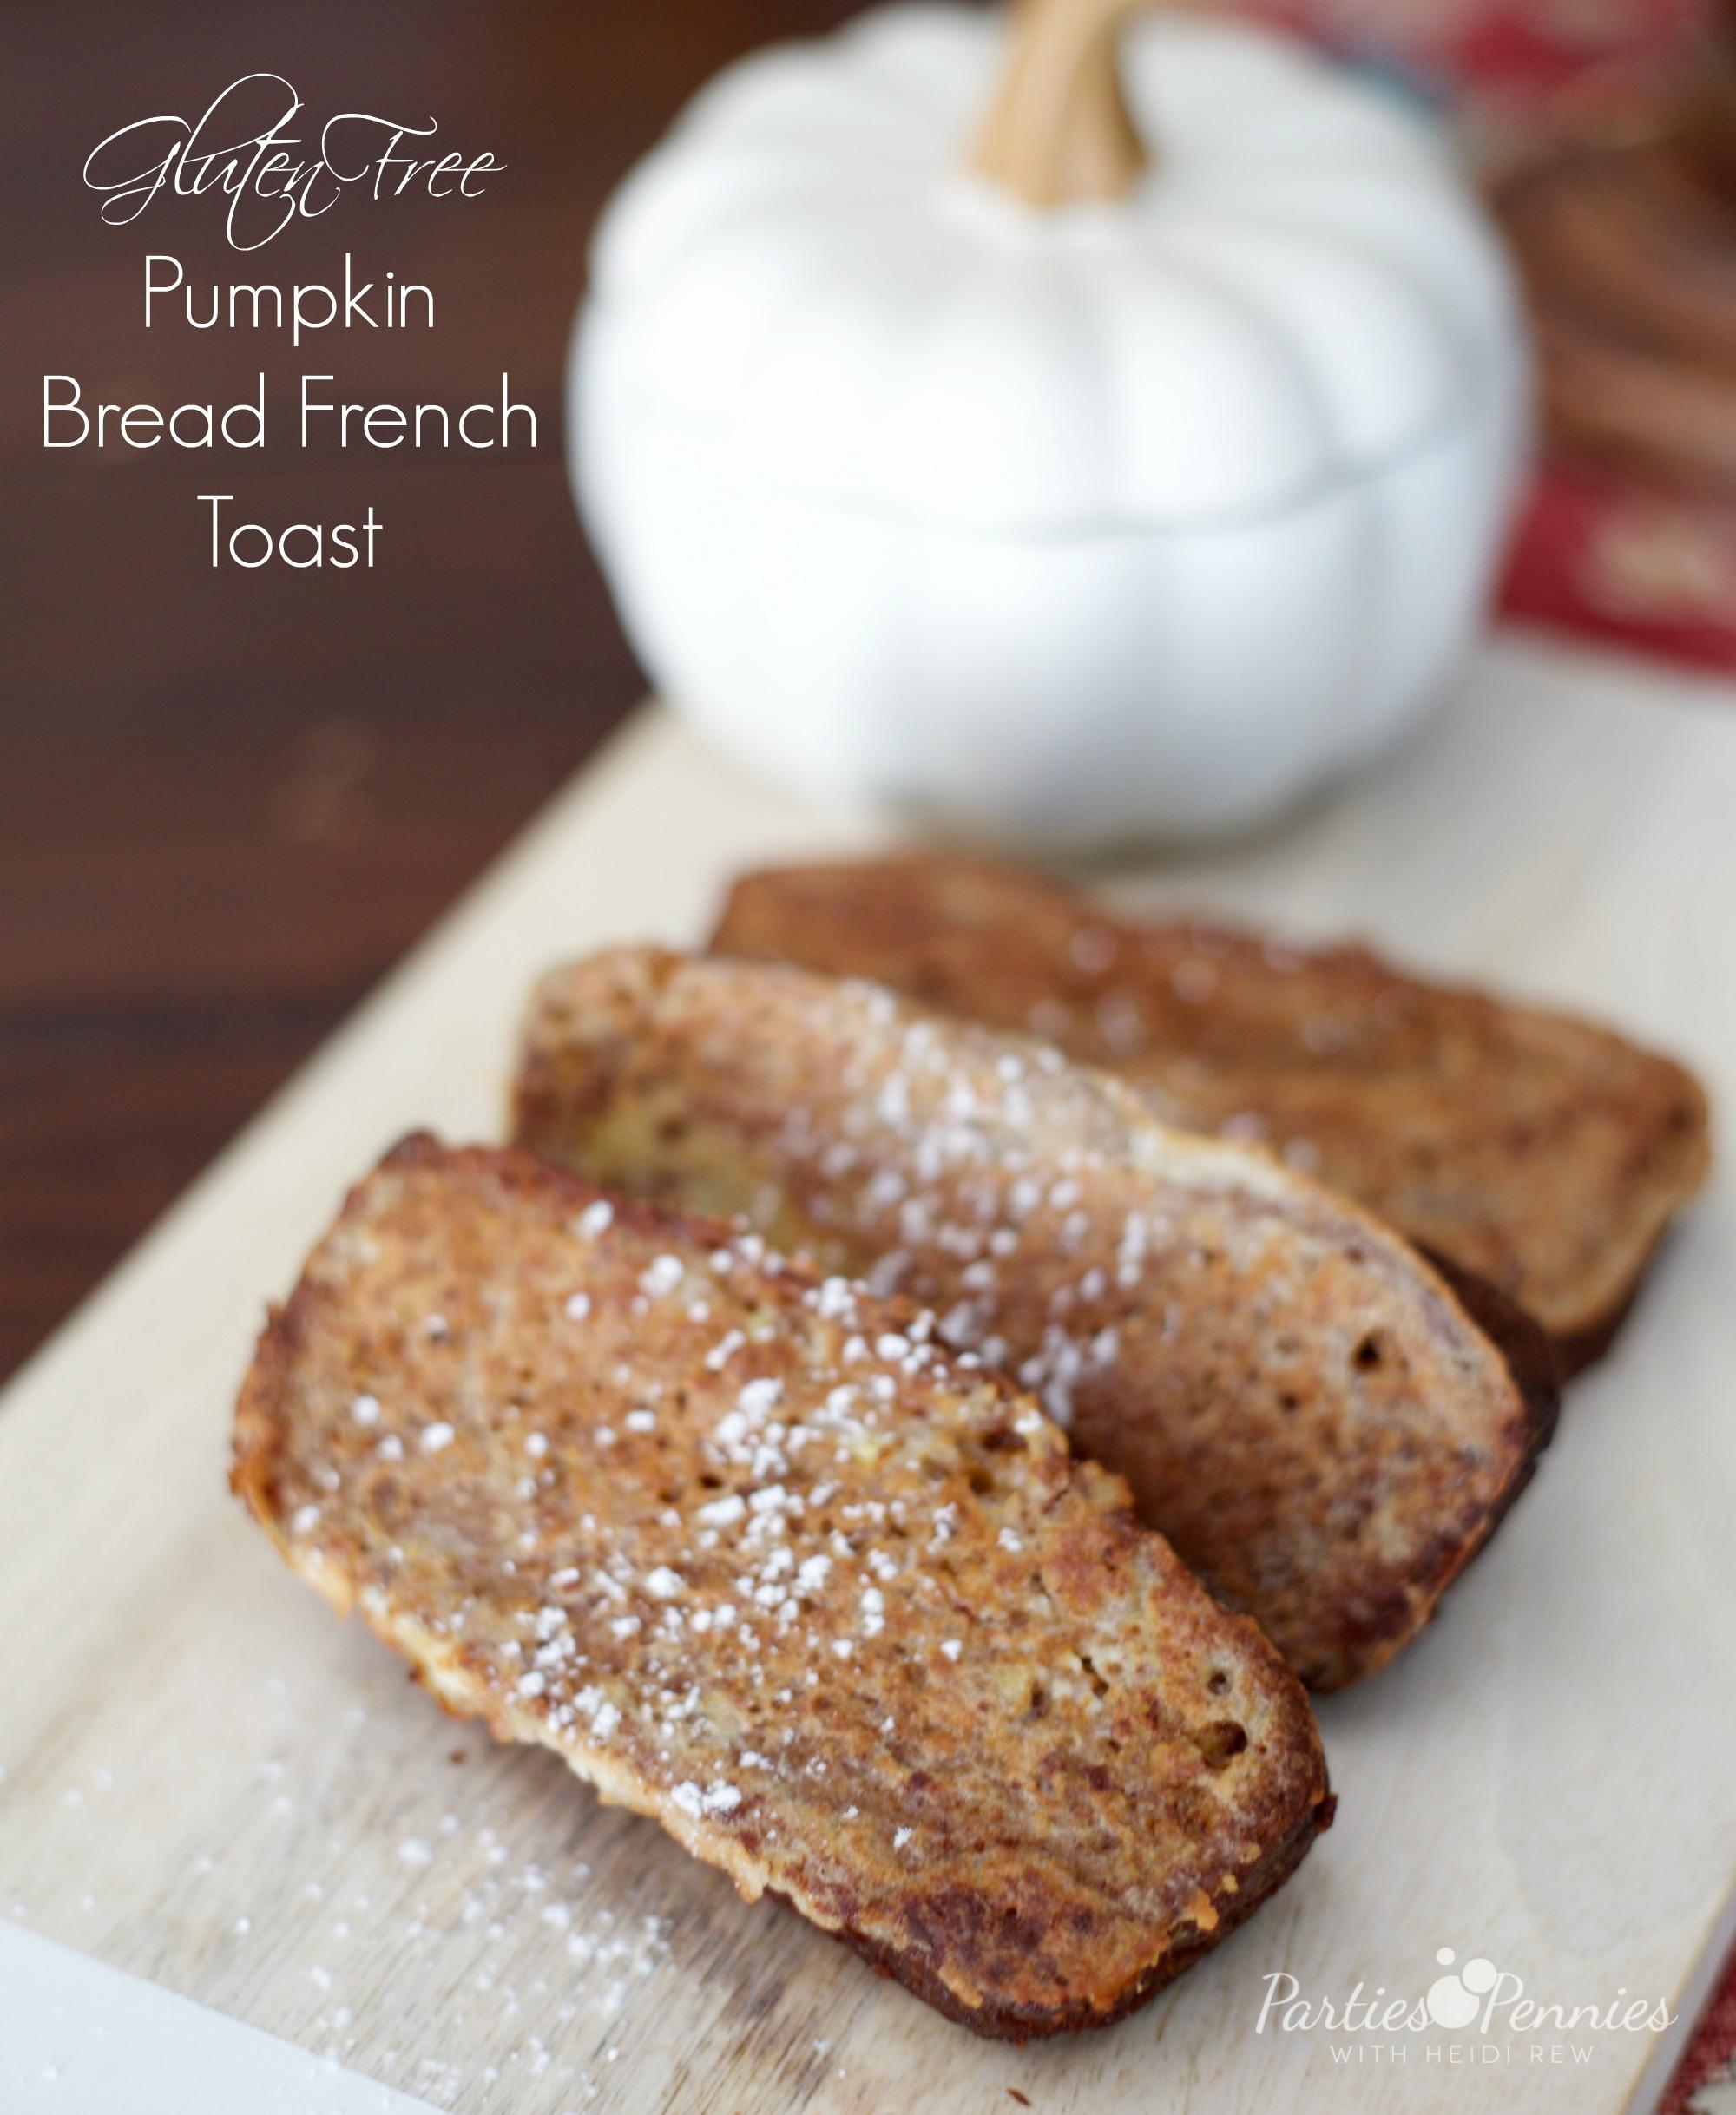 Gluten Free Pumpkin Bread French Toast Recipe | PartiesforPennies.com | #recipe #glutenfree #breakfast #brunch #pumpkin